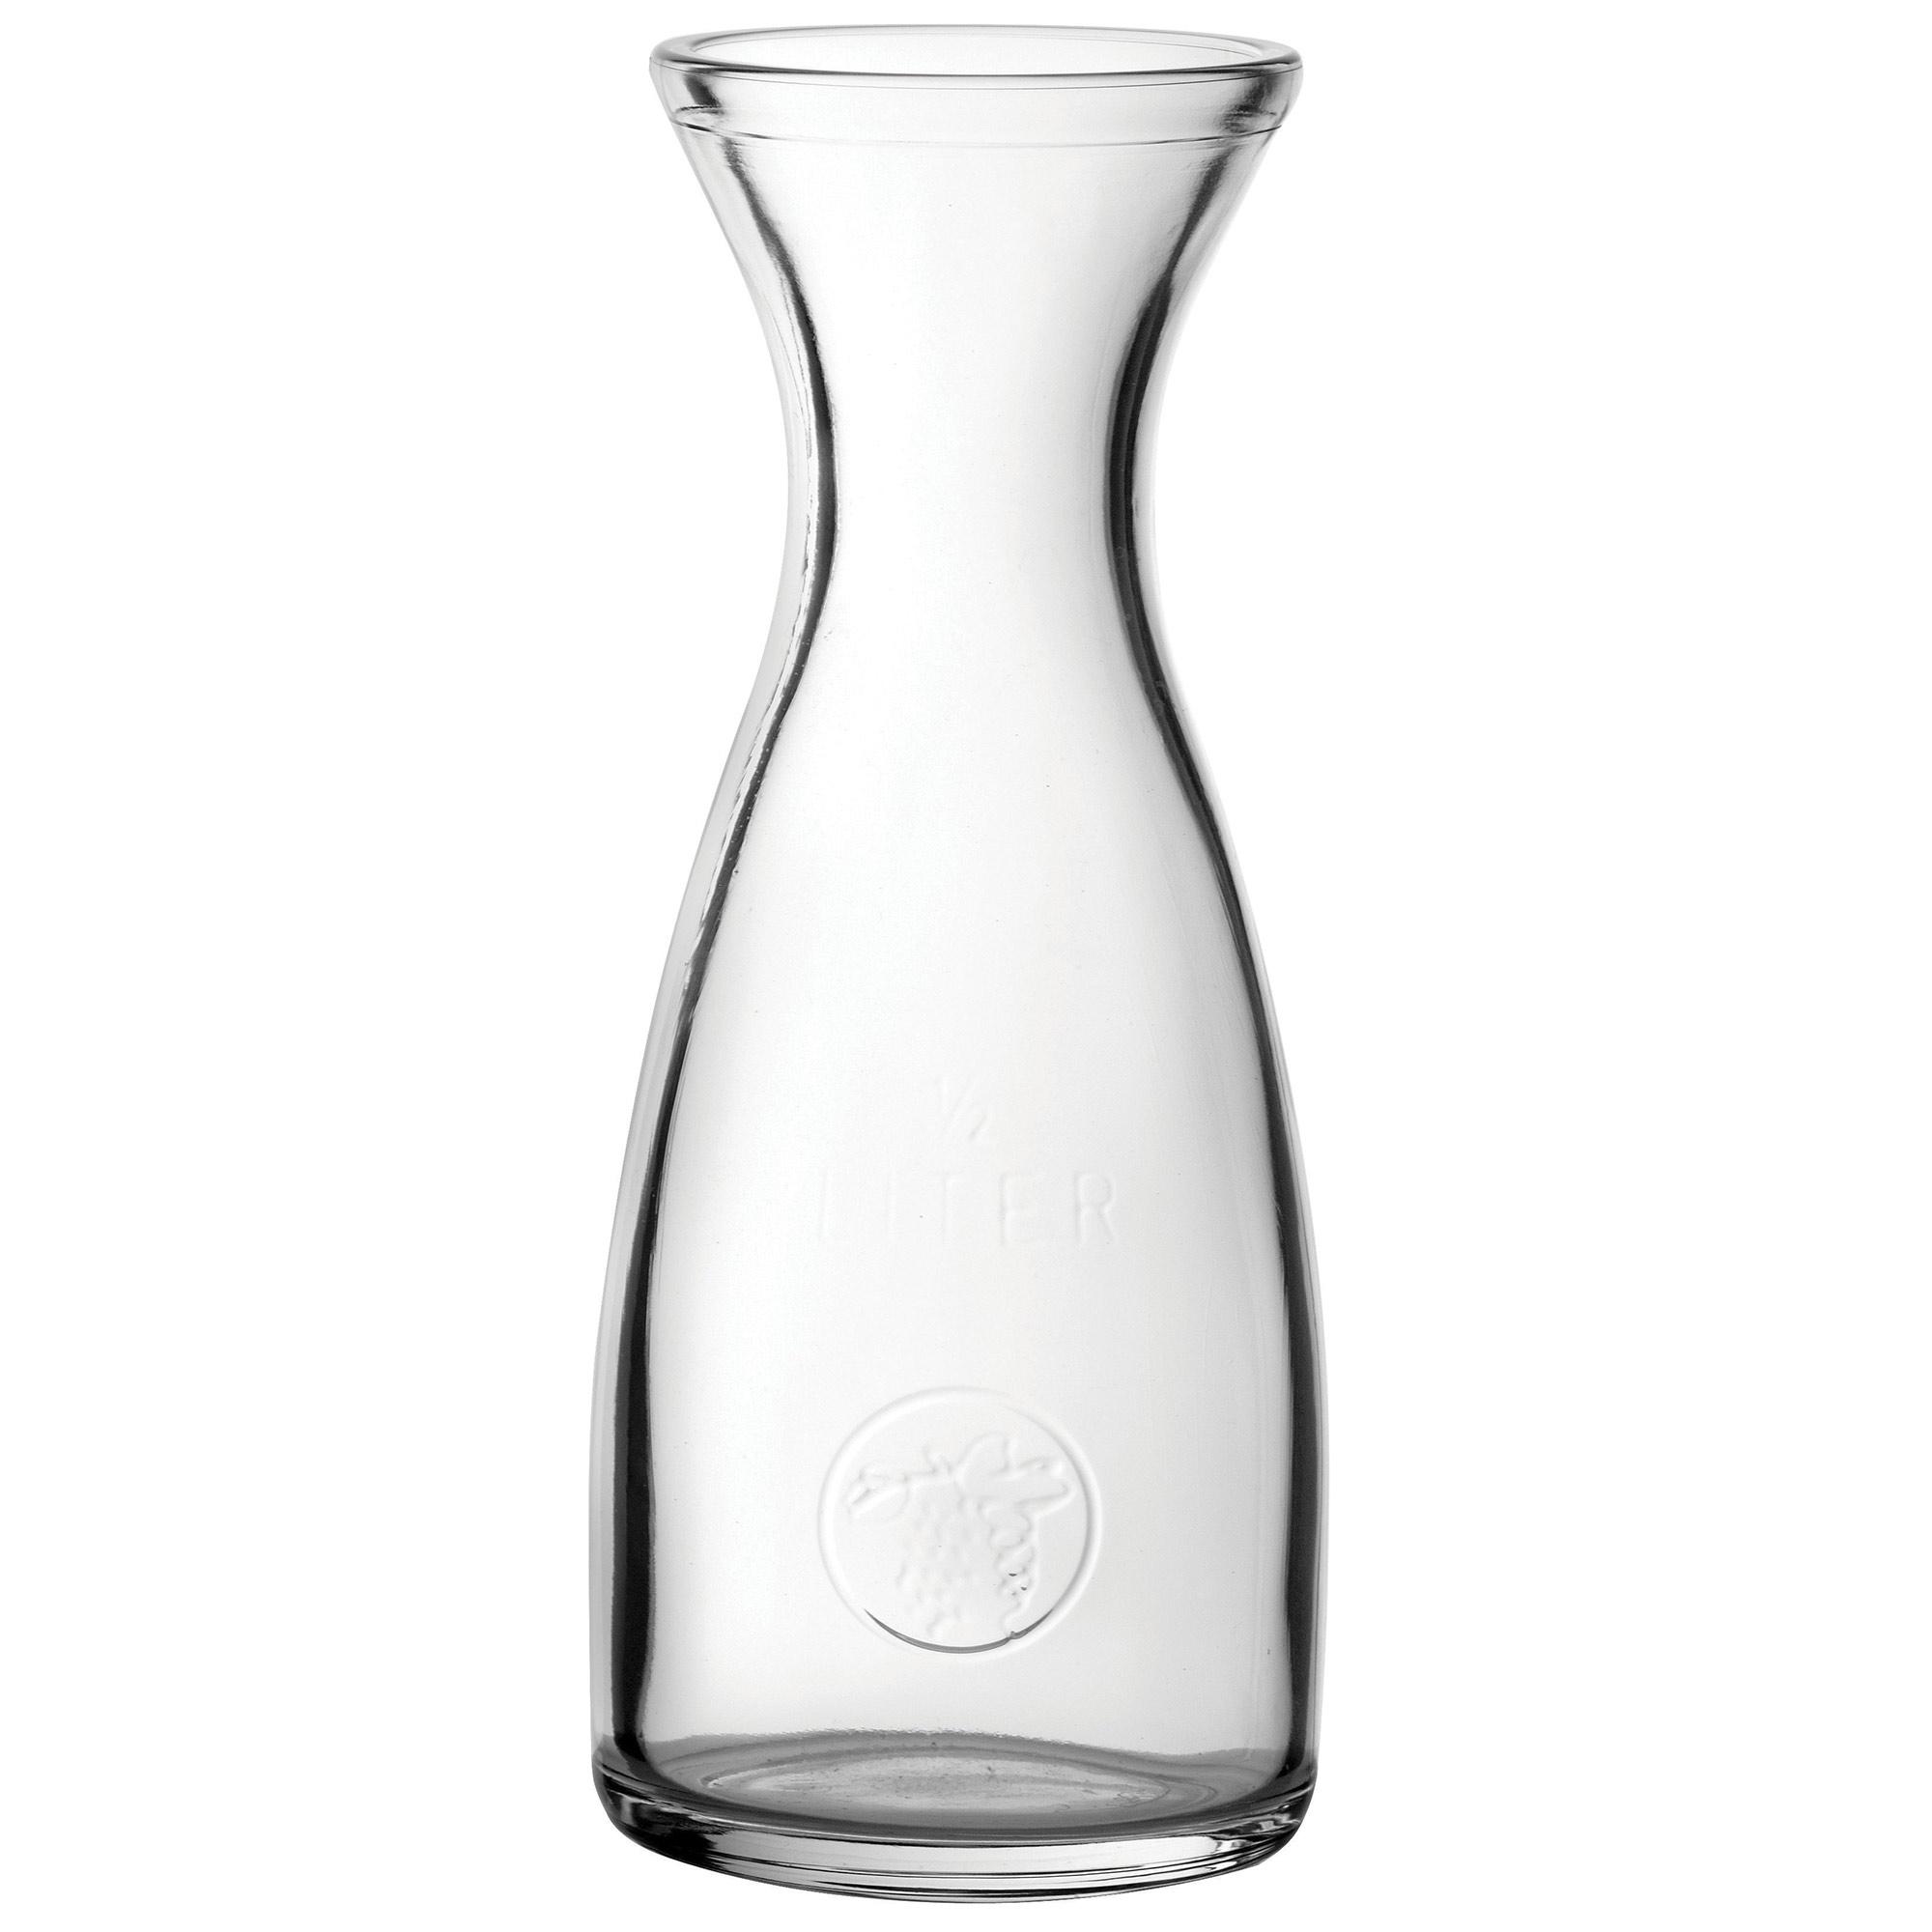 Economy Glass Carafe At Drinkstuff Com